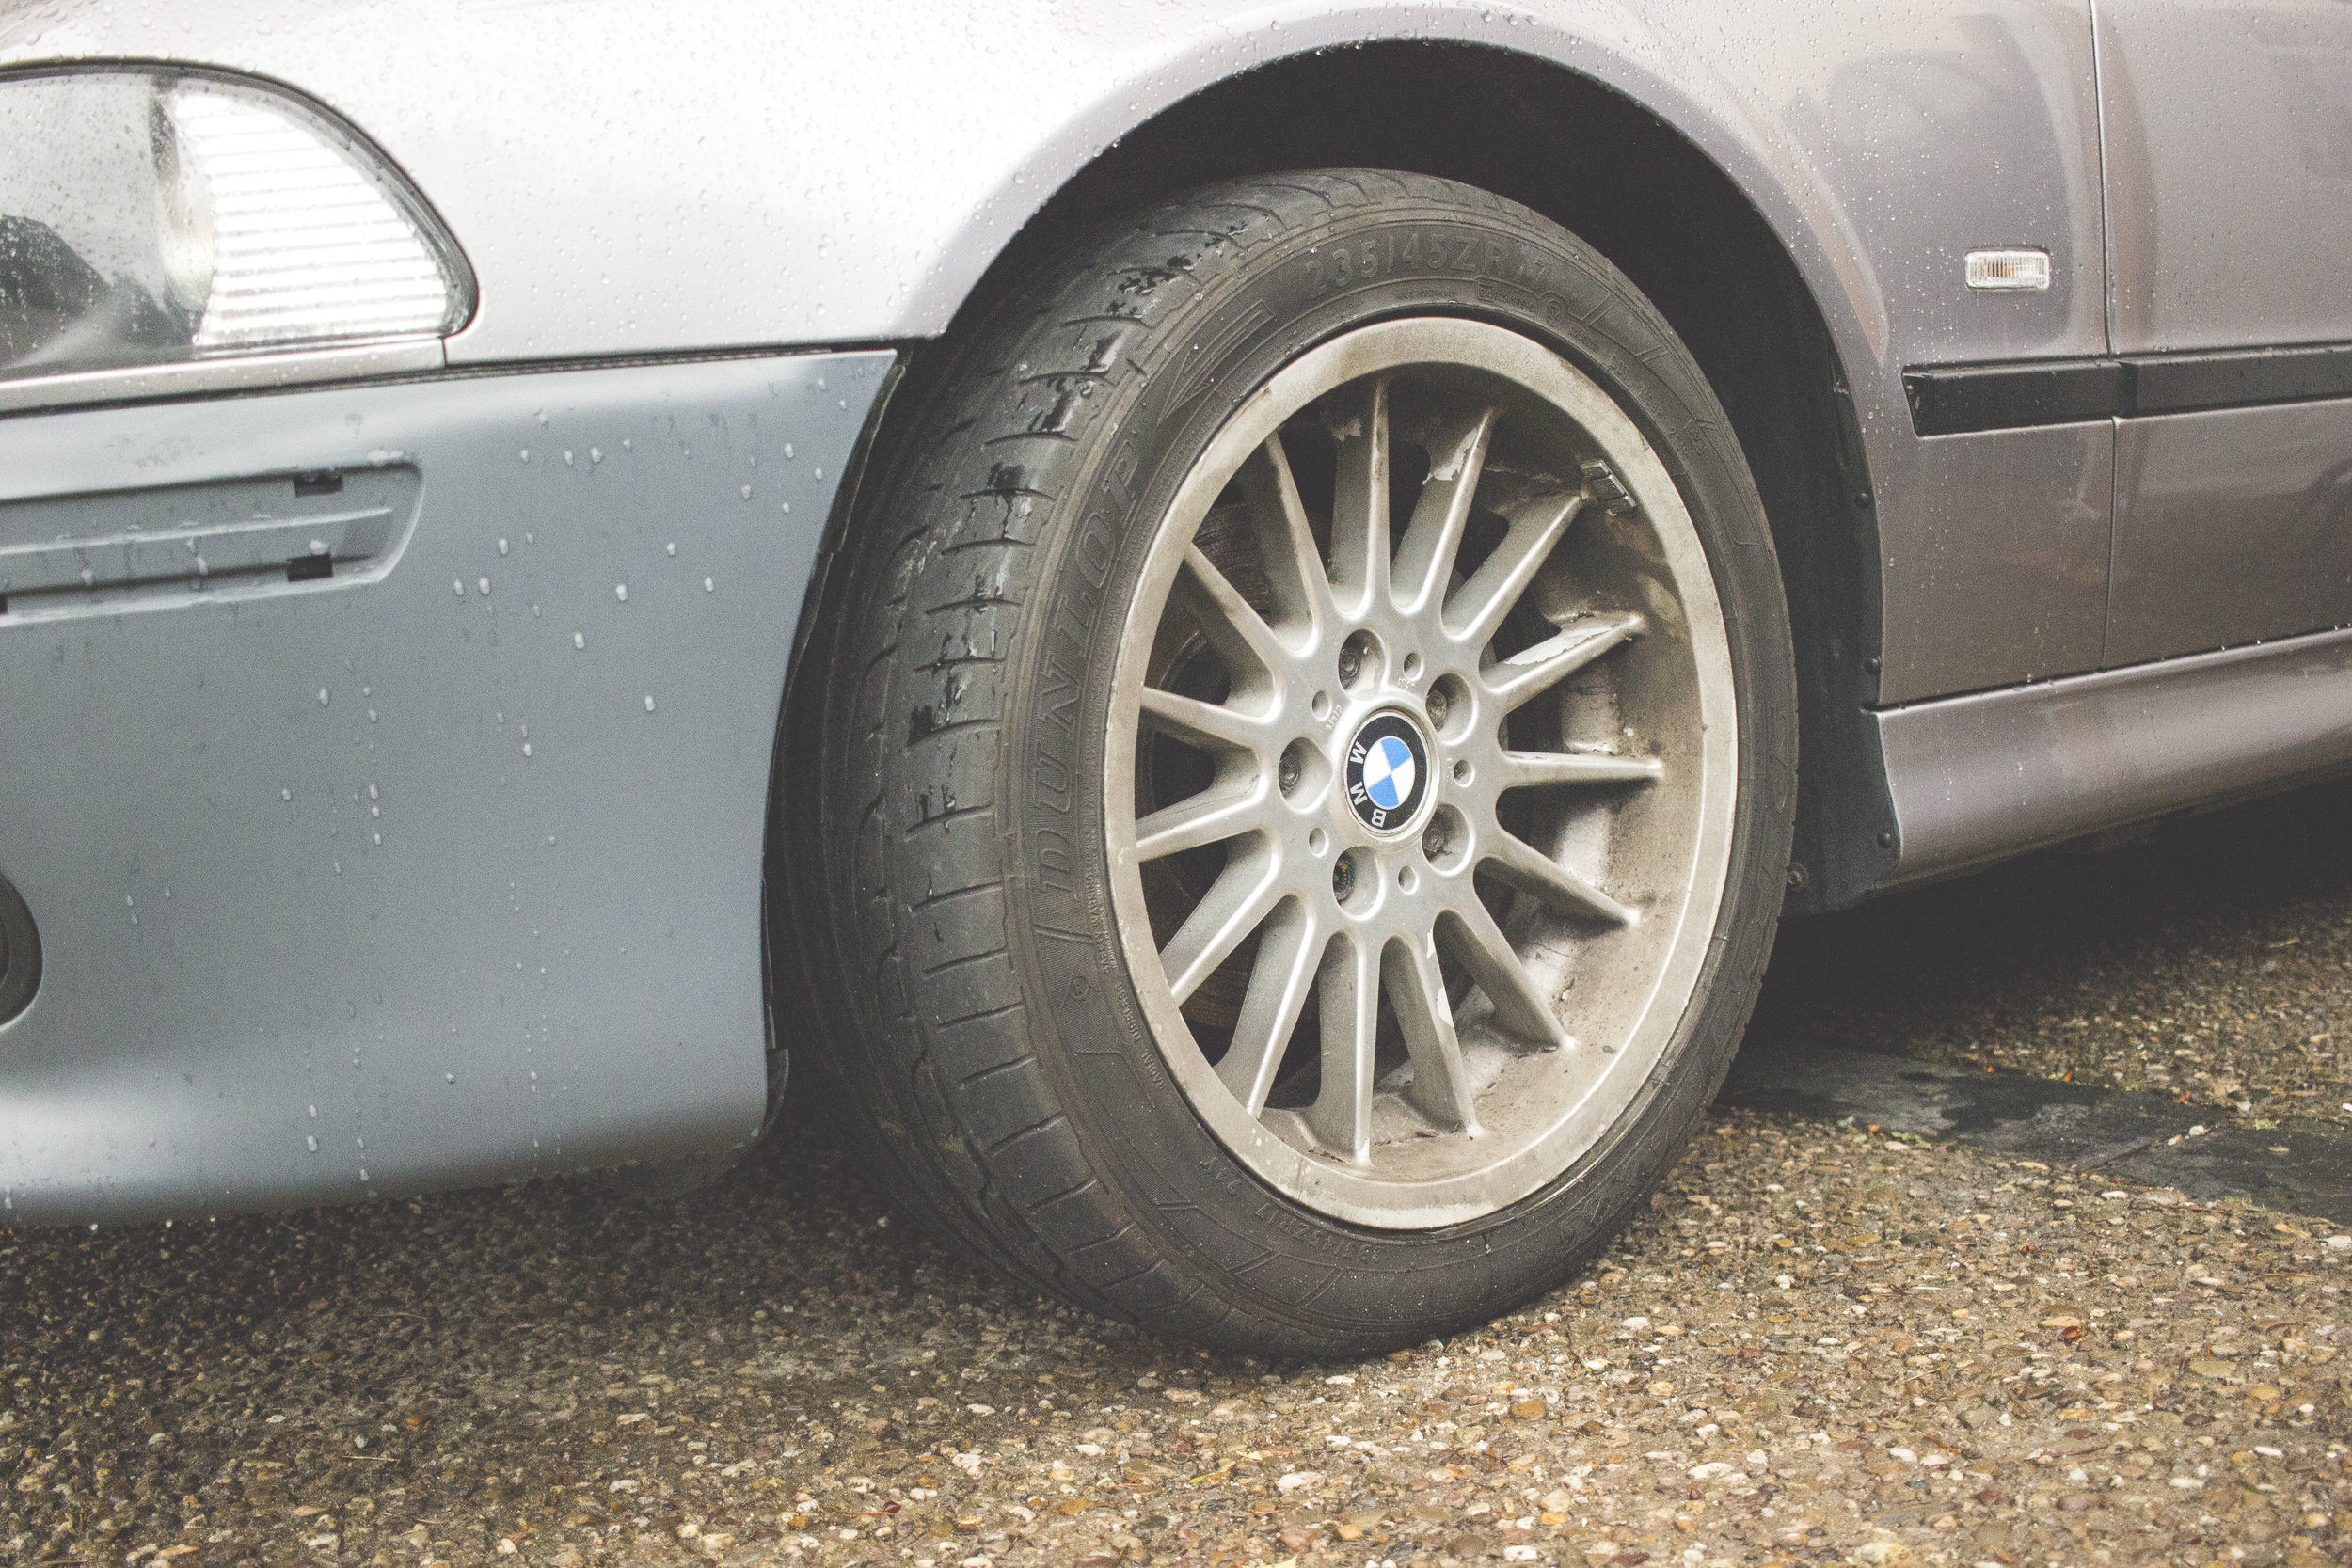 Mömus BMW E39 wheels and springs lowering wheel gap